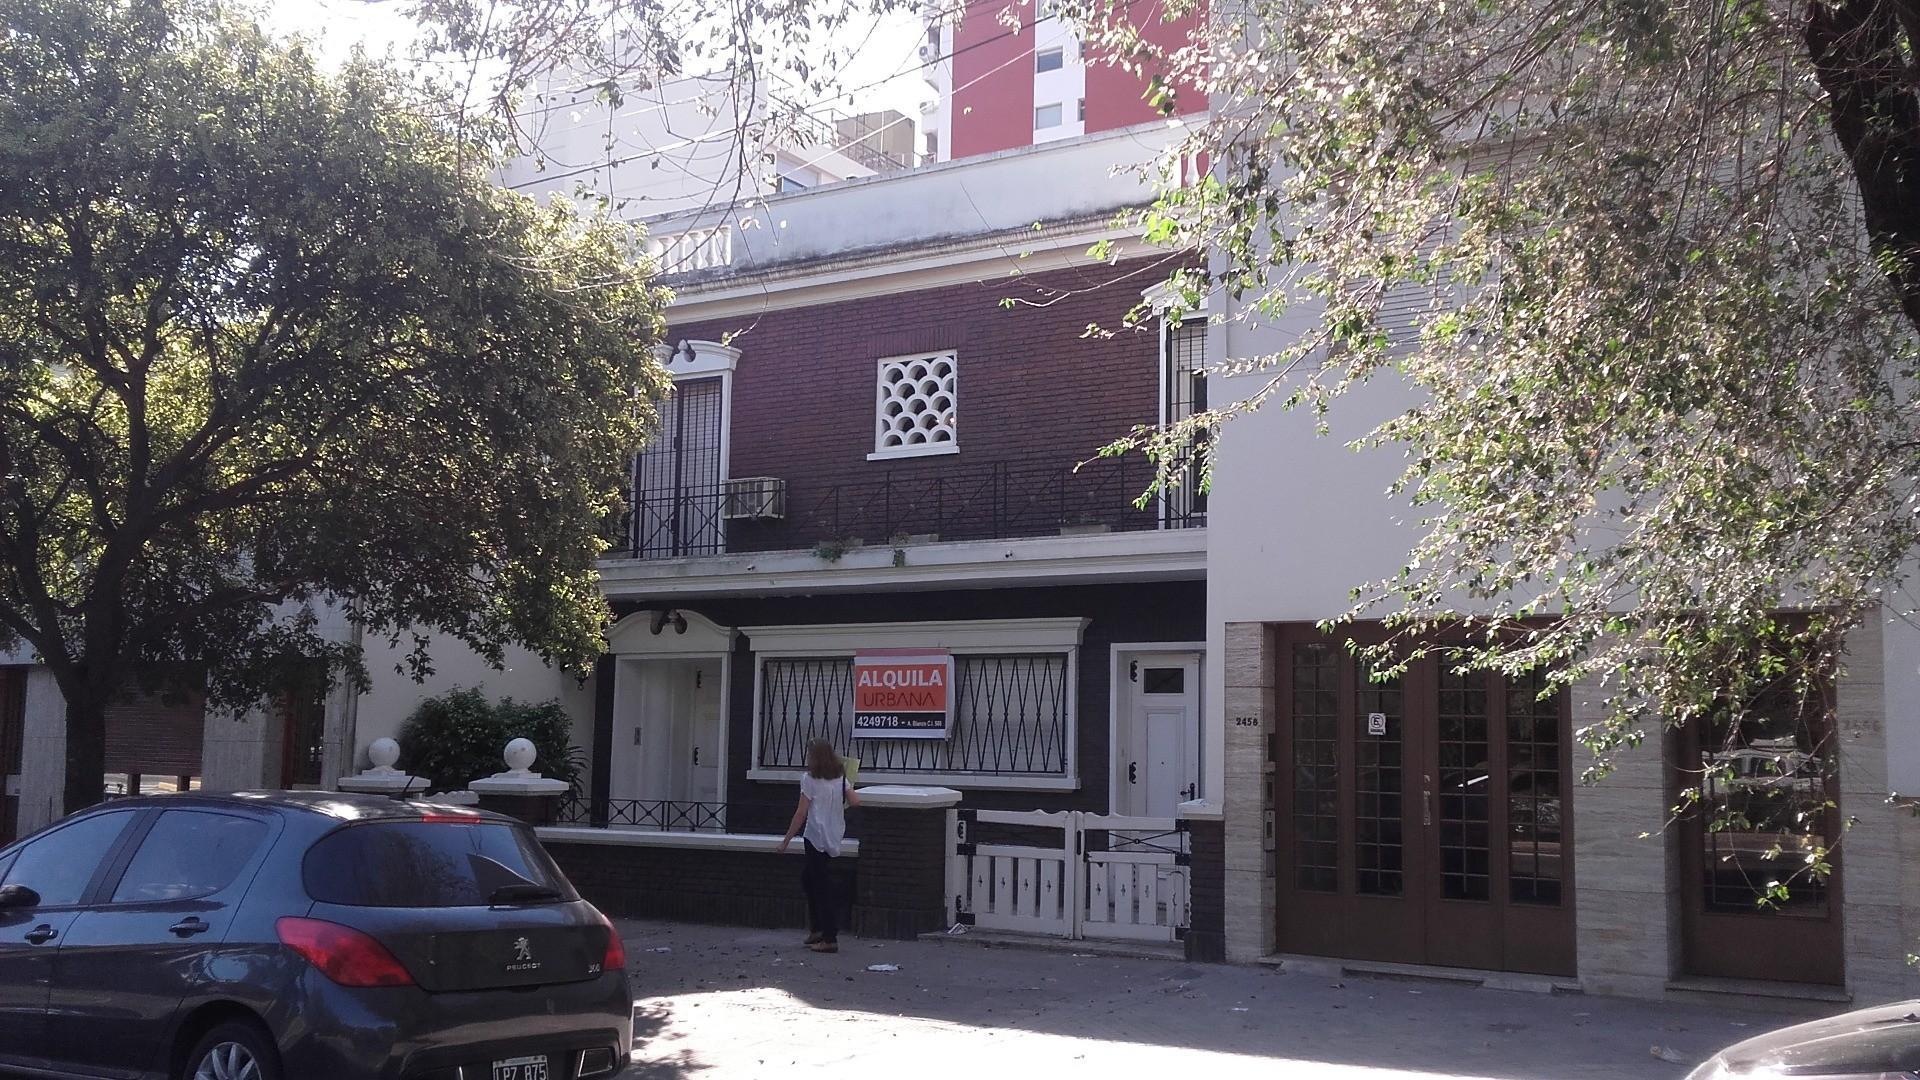 Casa 3 dormitorios. PARQUE y PILETA - Pellegrini frente a parque